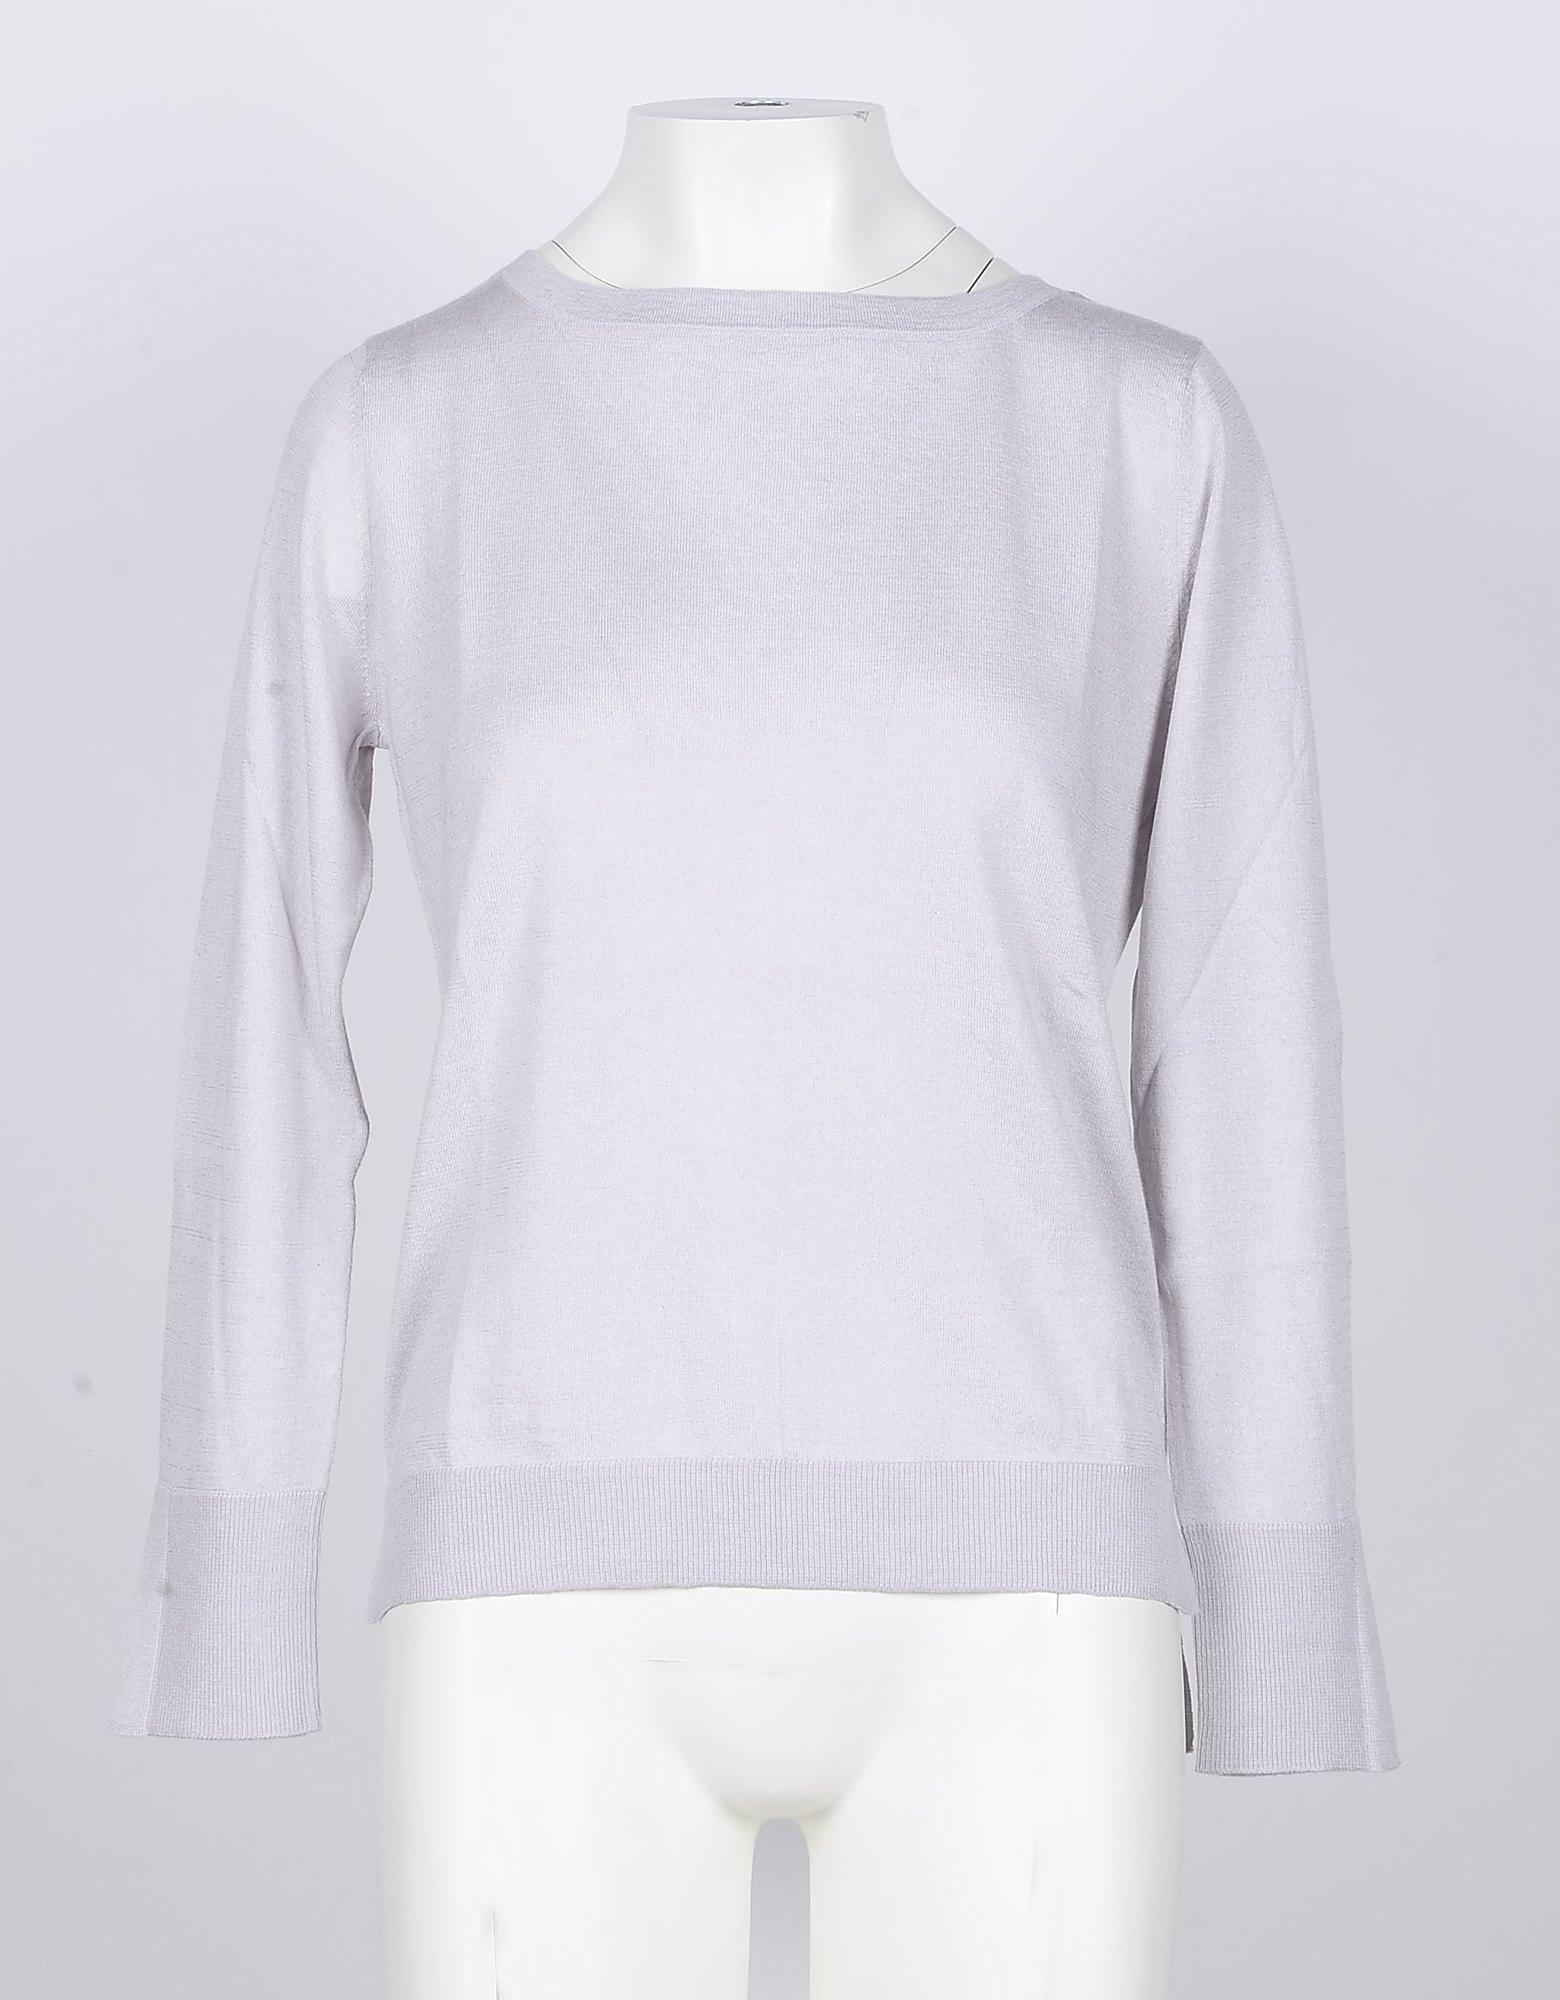 SNOBBY SHEEP Designer Knitwear, Ice Gray Silk/Cashmere Blend Women's Sweater